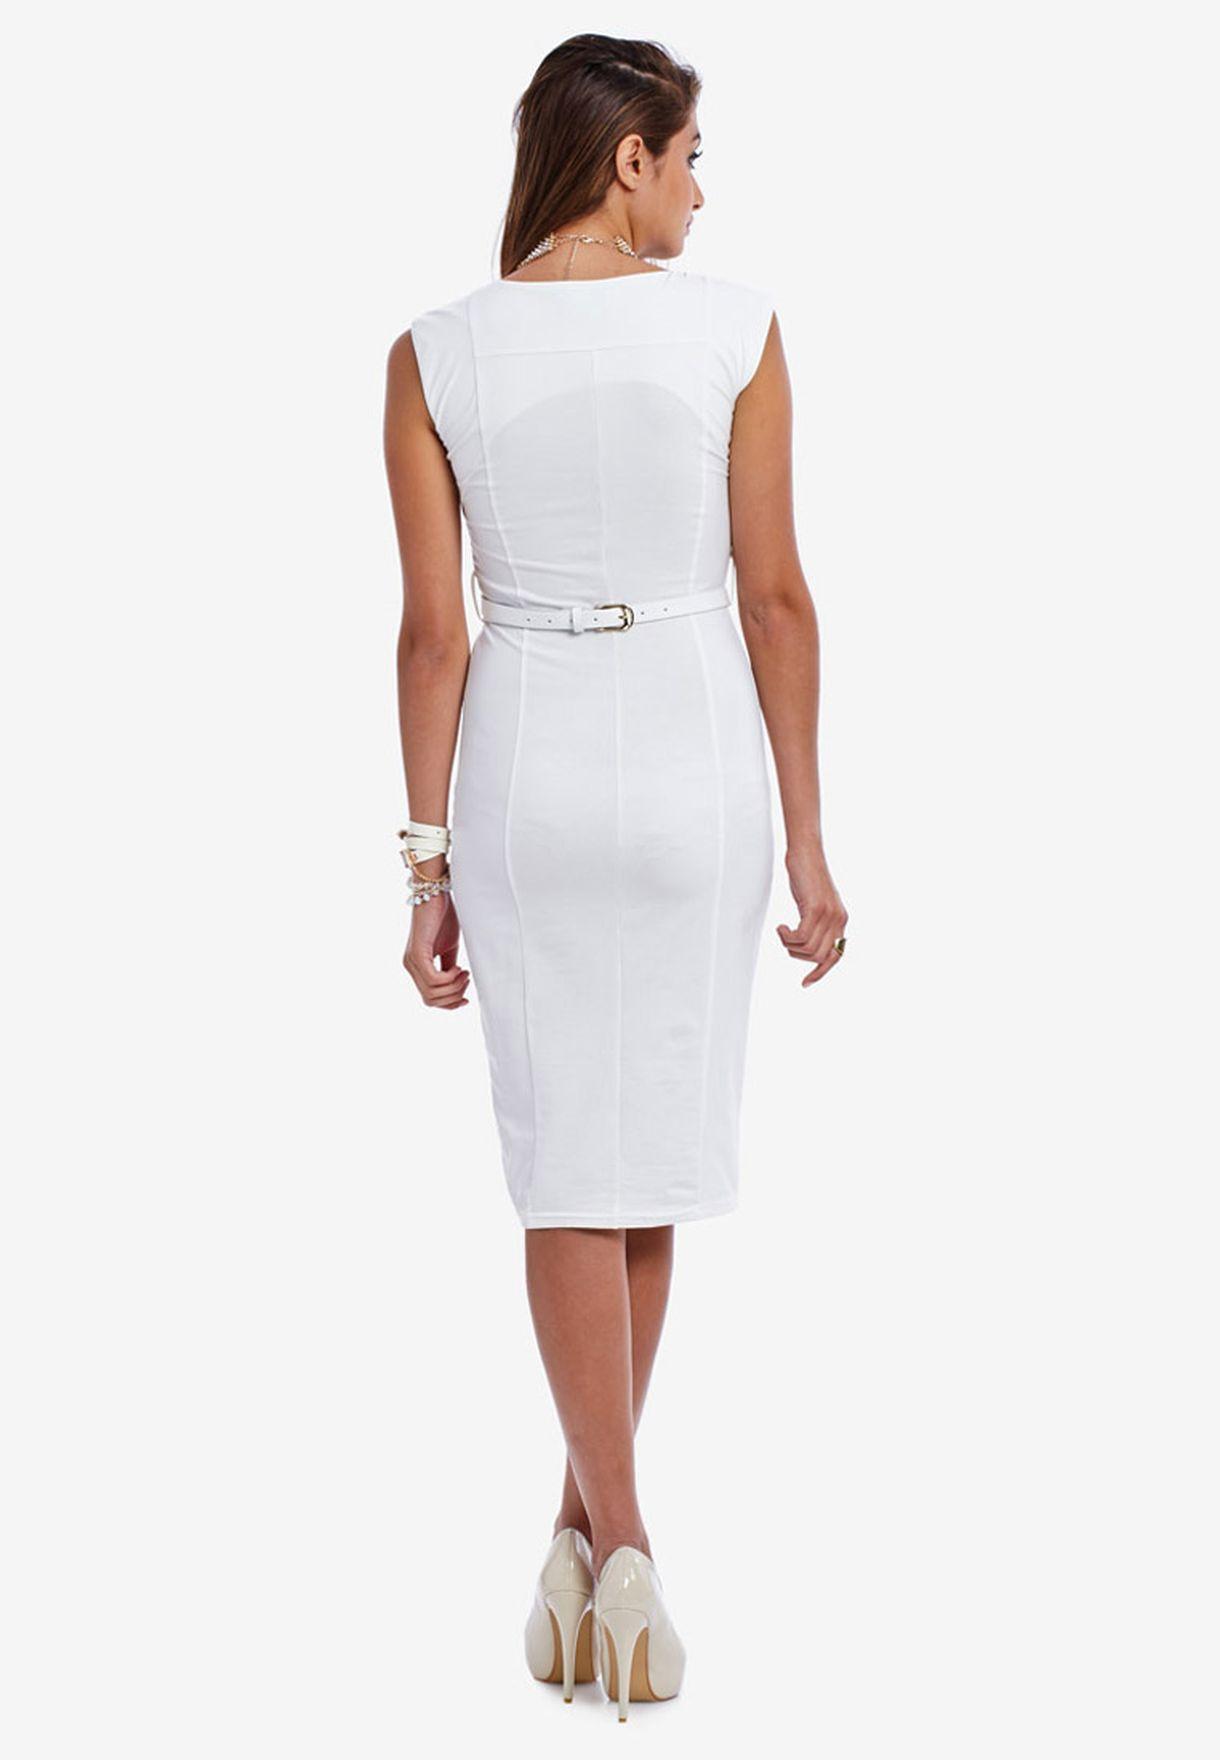 3a8633cd5c063 Shop Ax paris white Sleeveless Midi Dress for Women in Kuwait ...